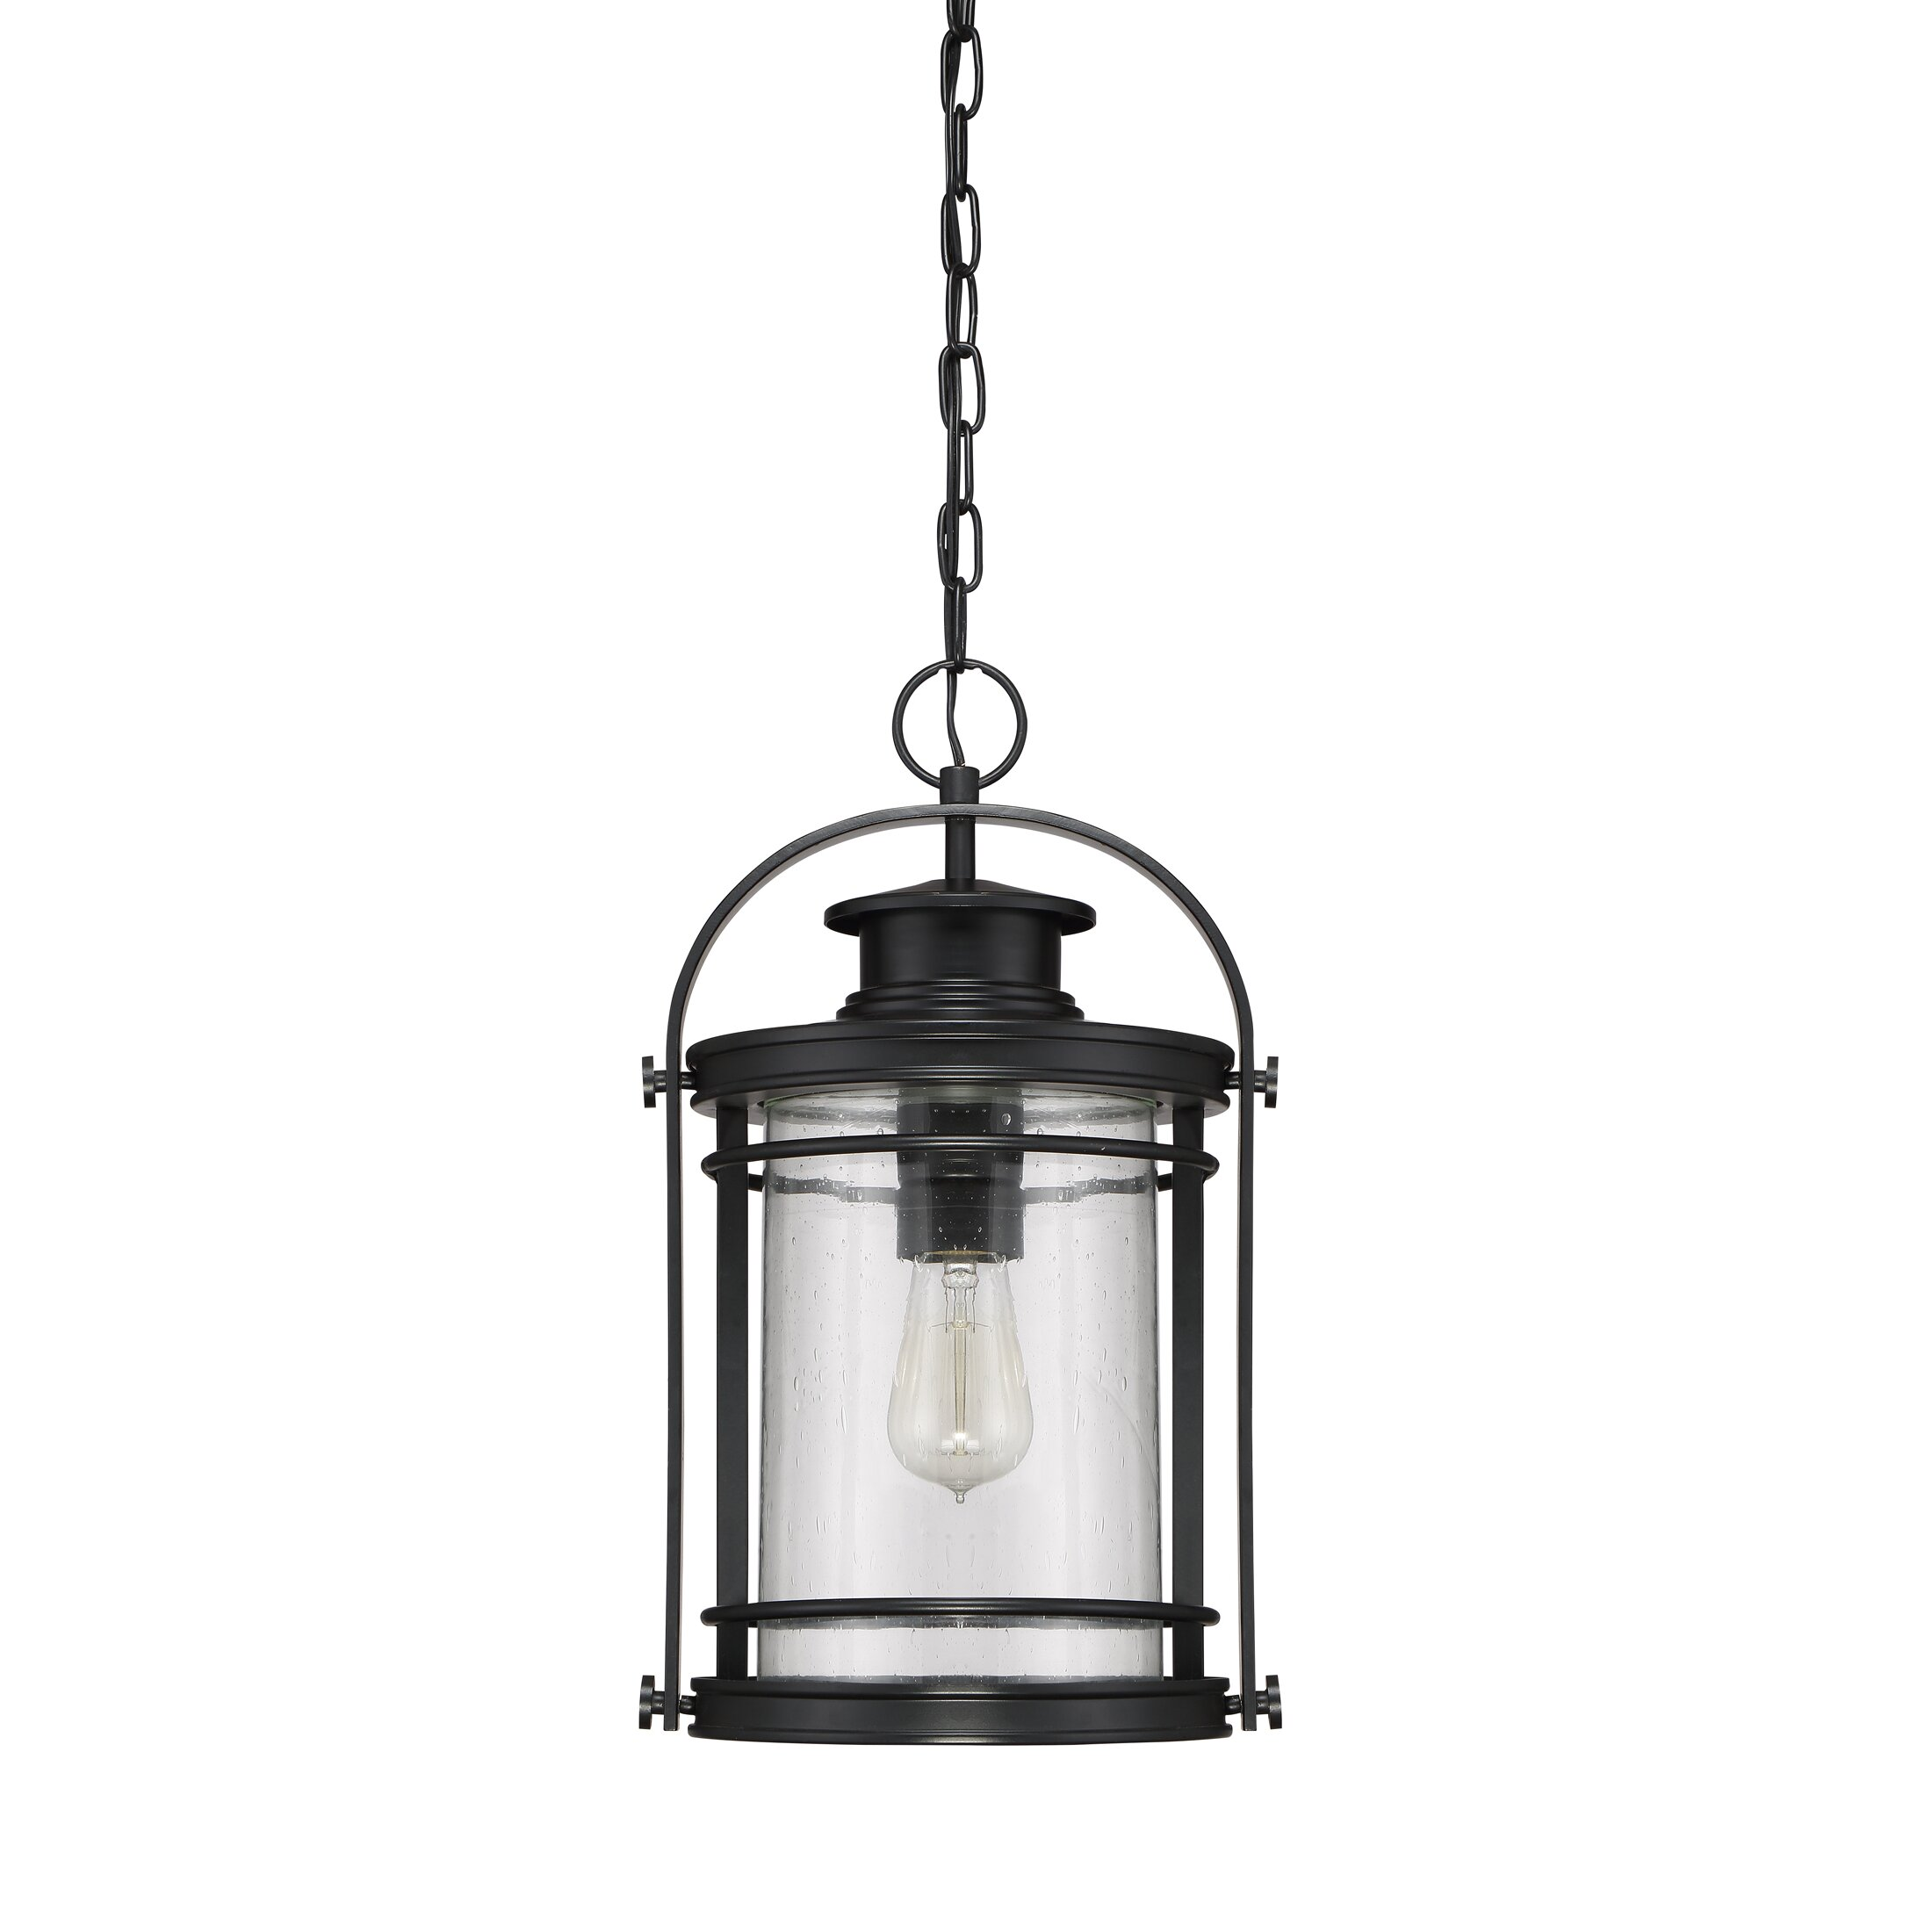 Wayfair Outdoor Hanging Lights: Breakwater Bay Ashton 1 Light Outdoor Hanging Lantern